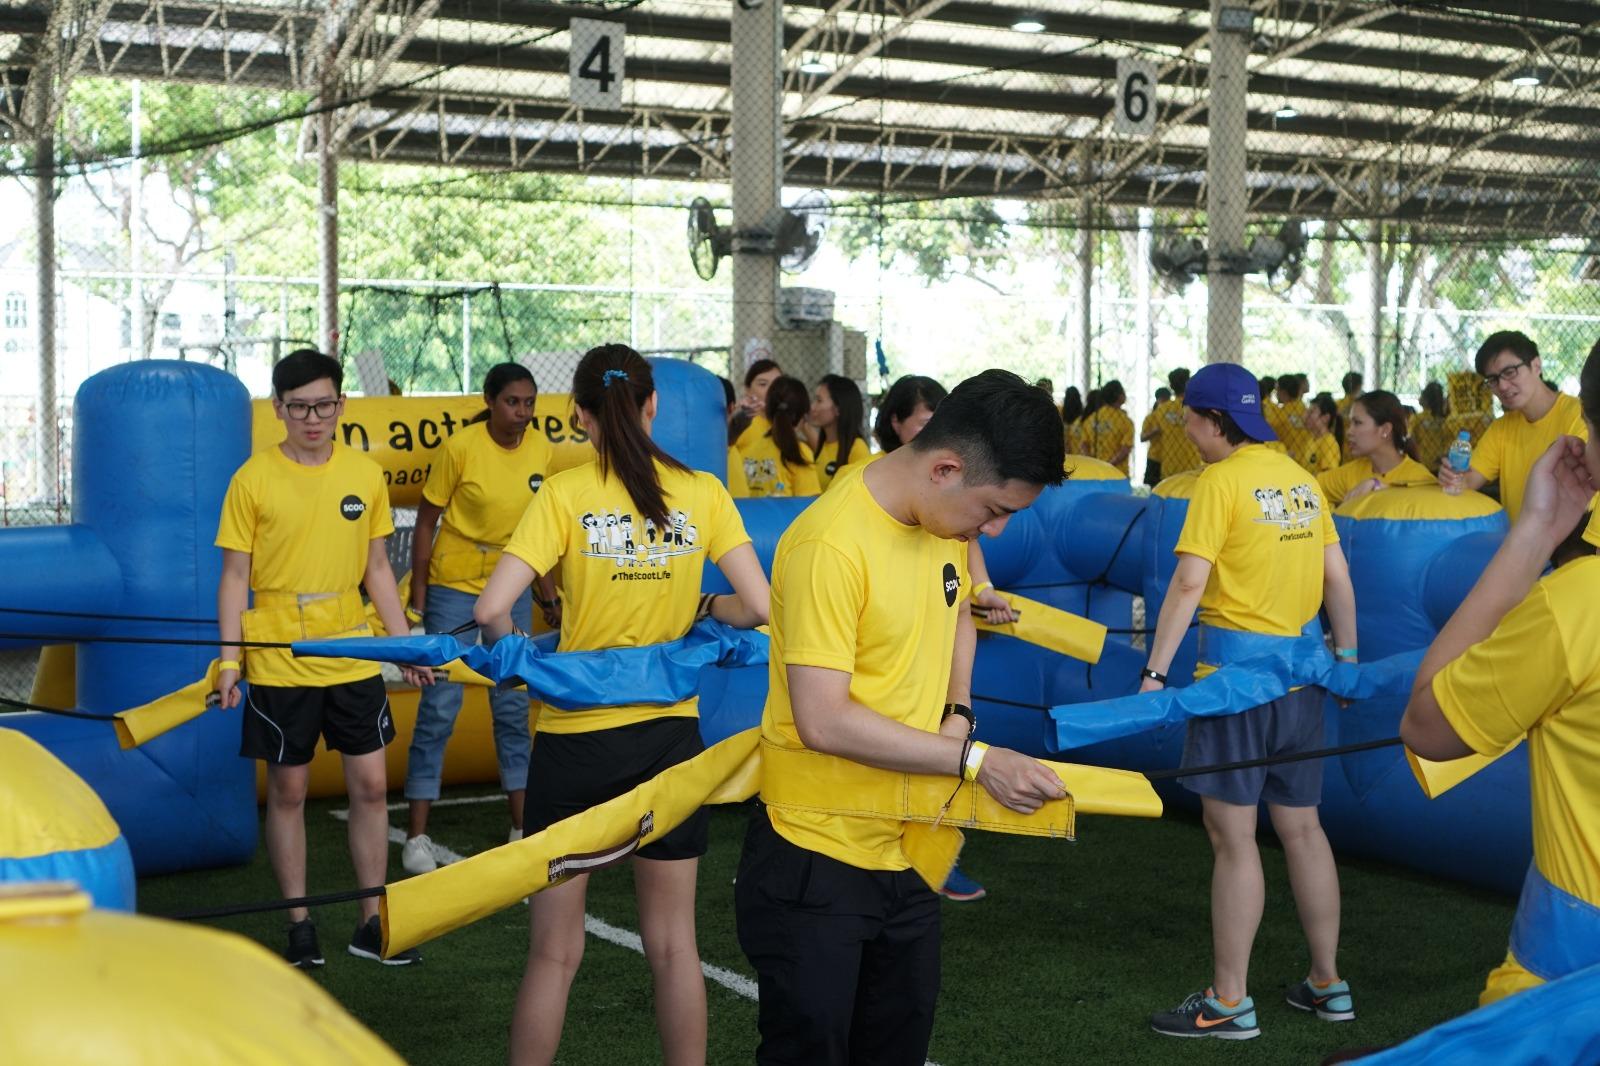 Fun_Activities_Sports_Day.jpeg